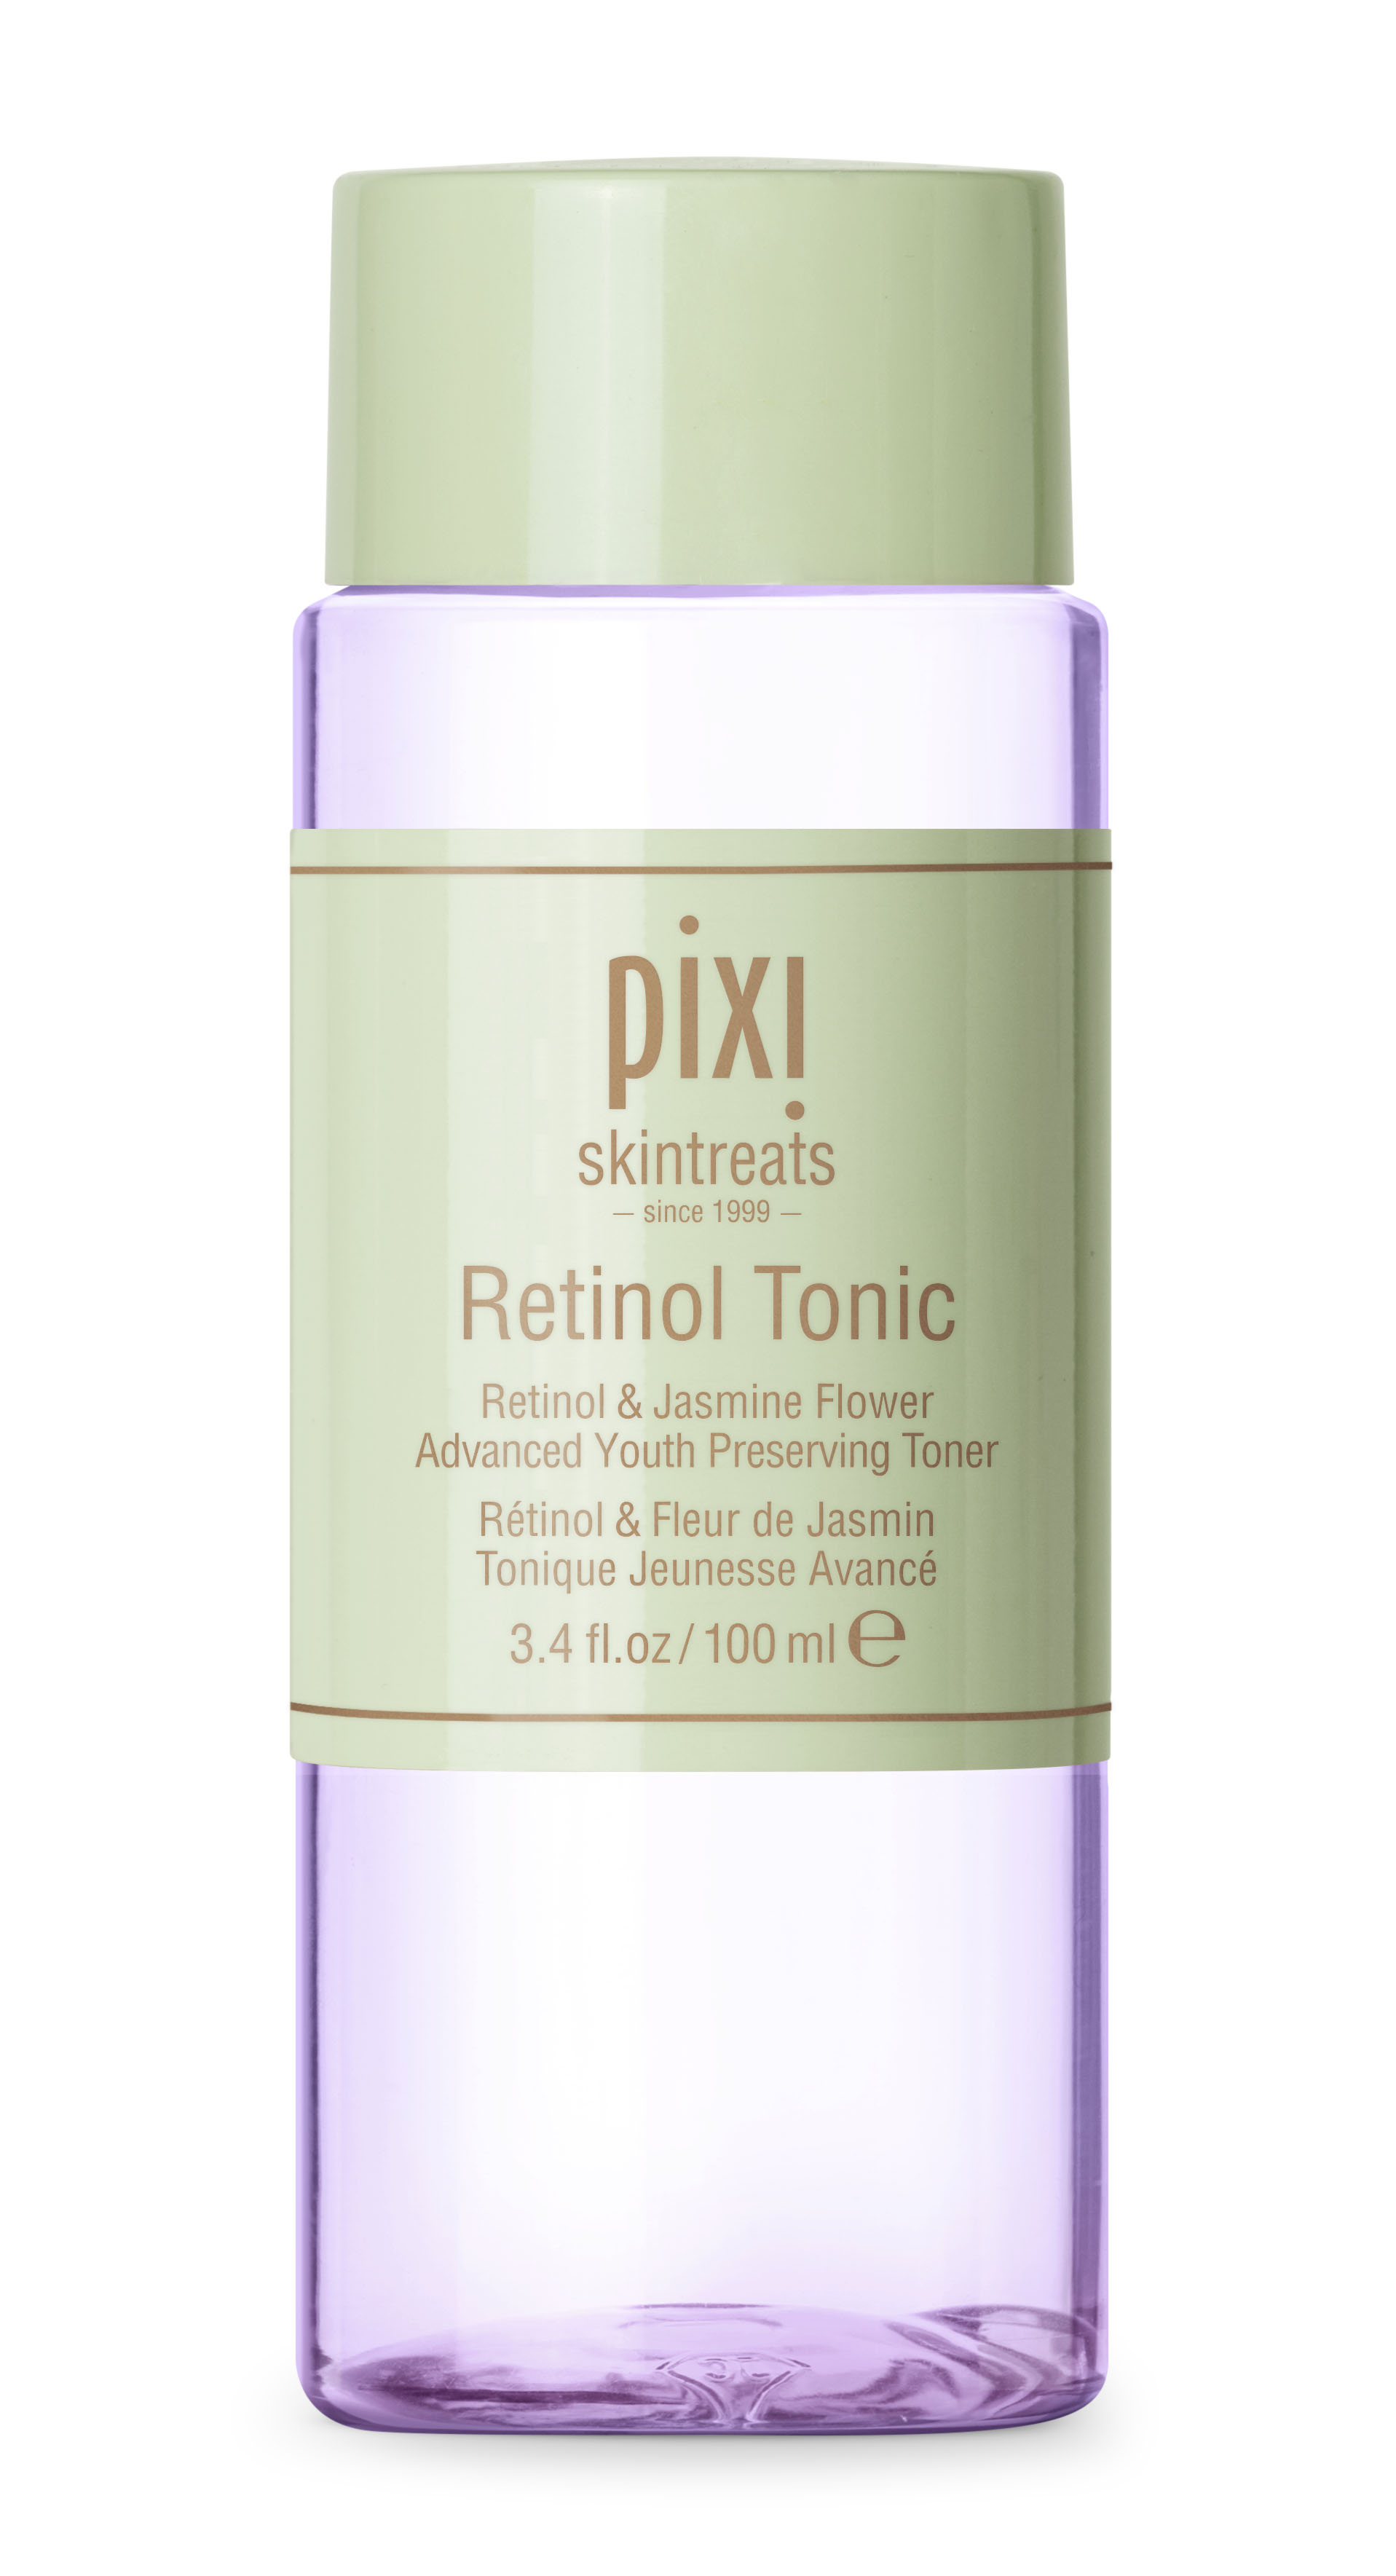 Retinol Tonic